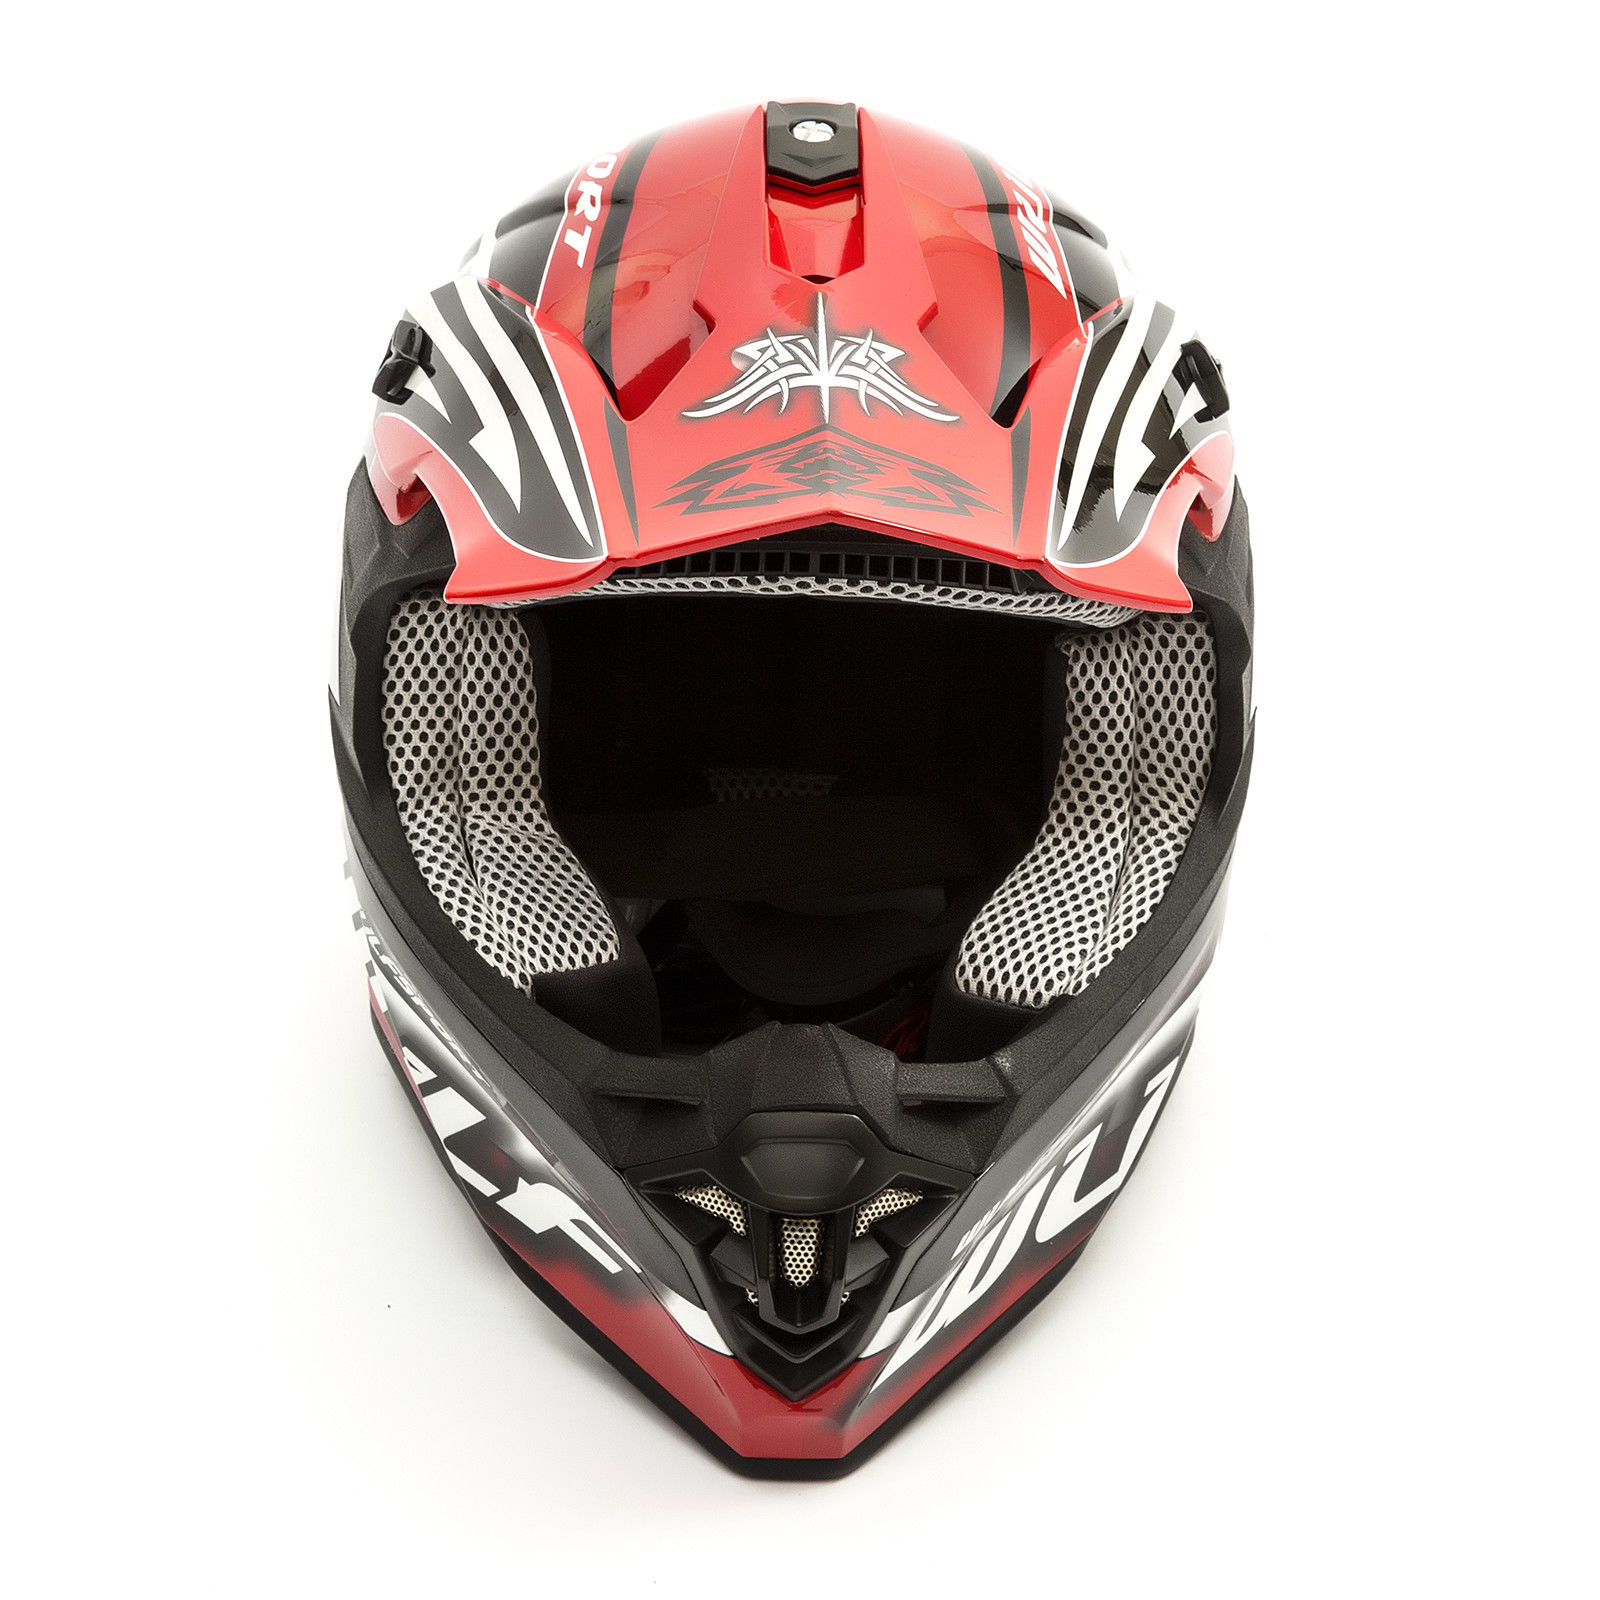 Wulfsport-Adult-Sceptre-Helmets-Motocross-Pitbike-Motorbike-Off-Road-Racing-ATV thumbnail 34